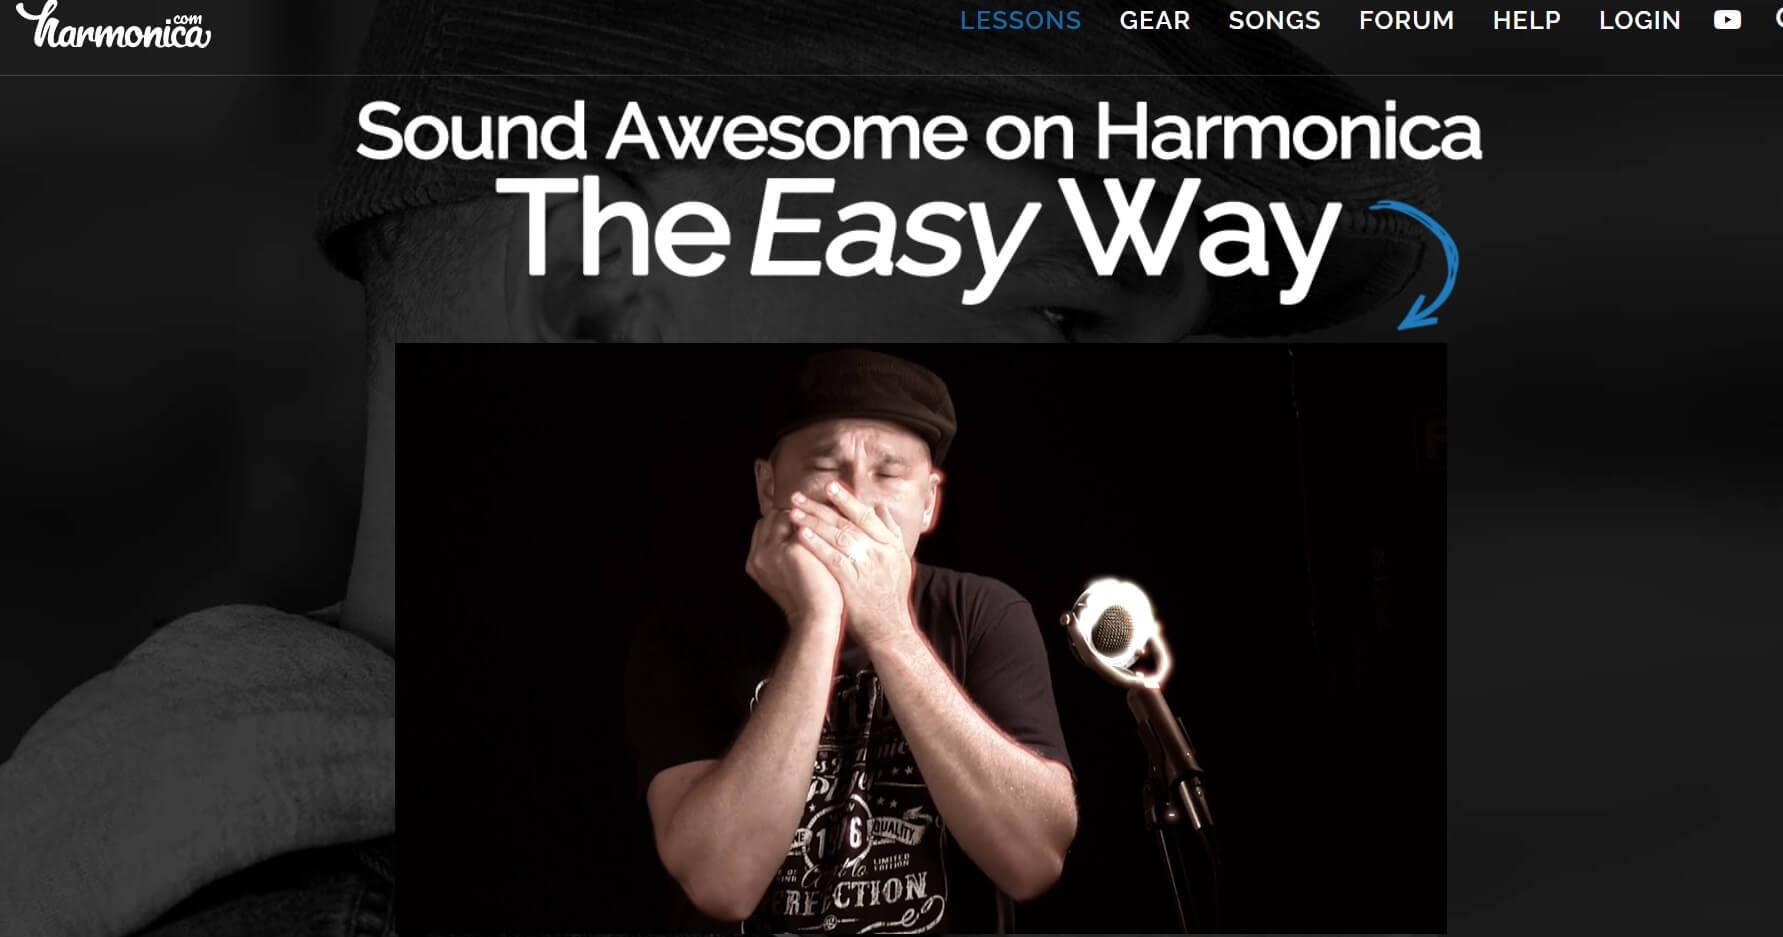 Harmonica.com platform with online harmonica courses